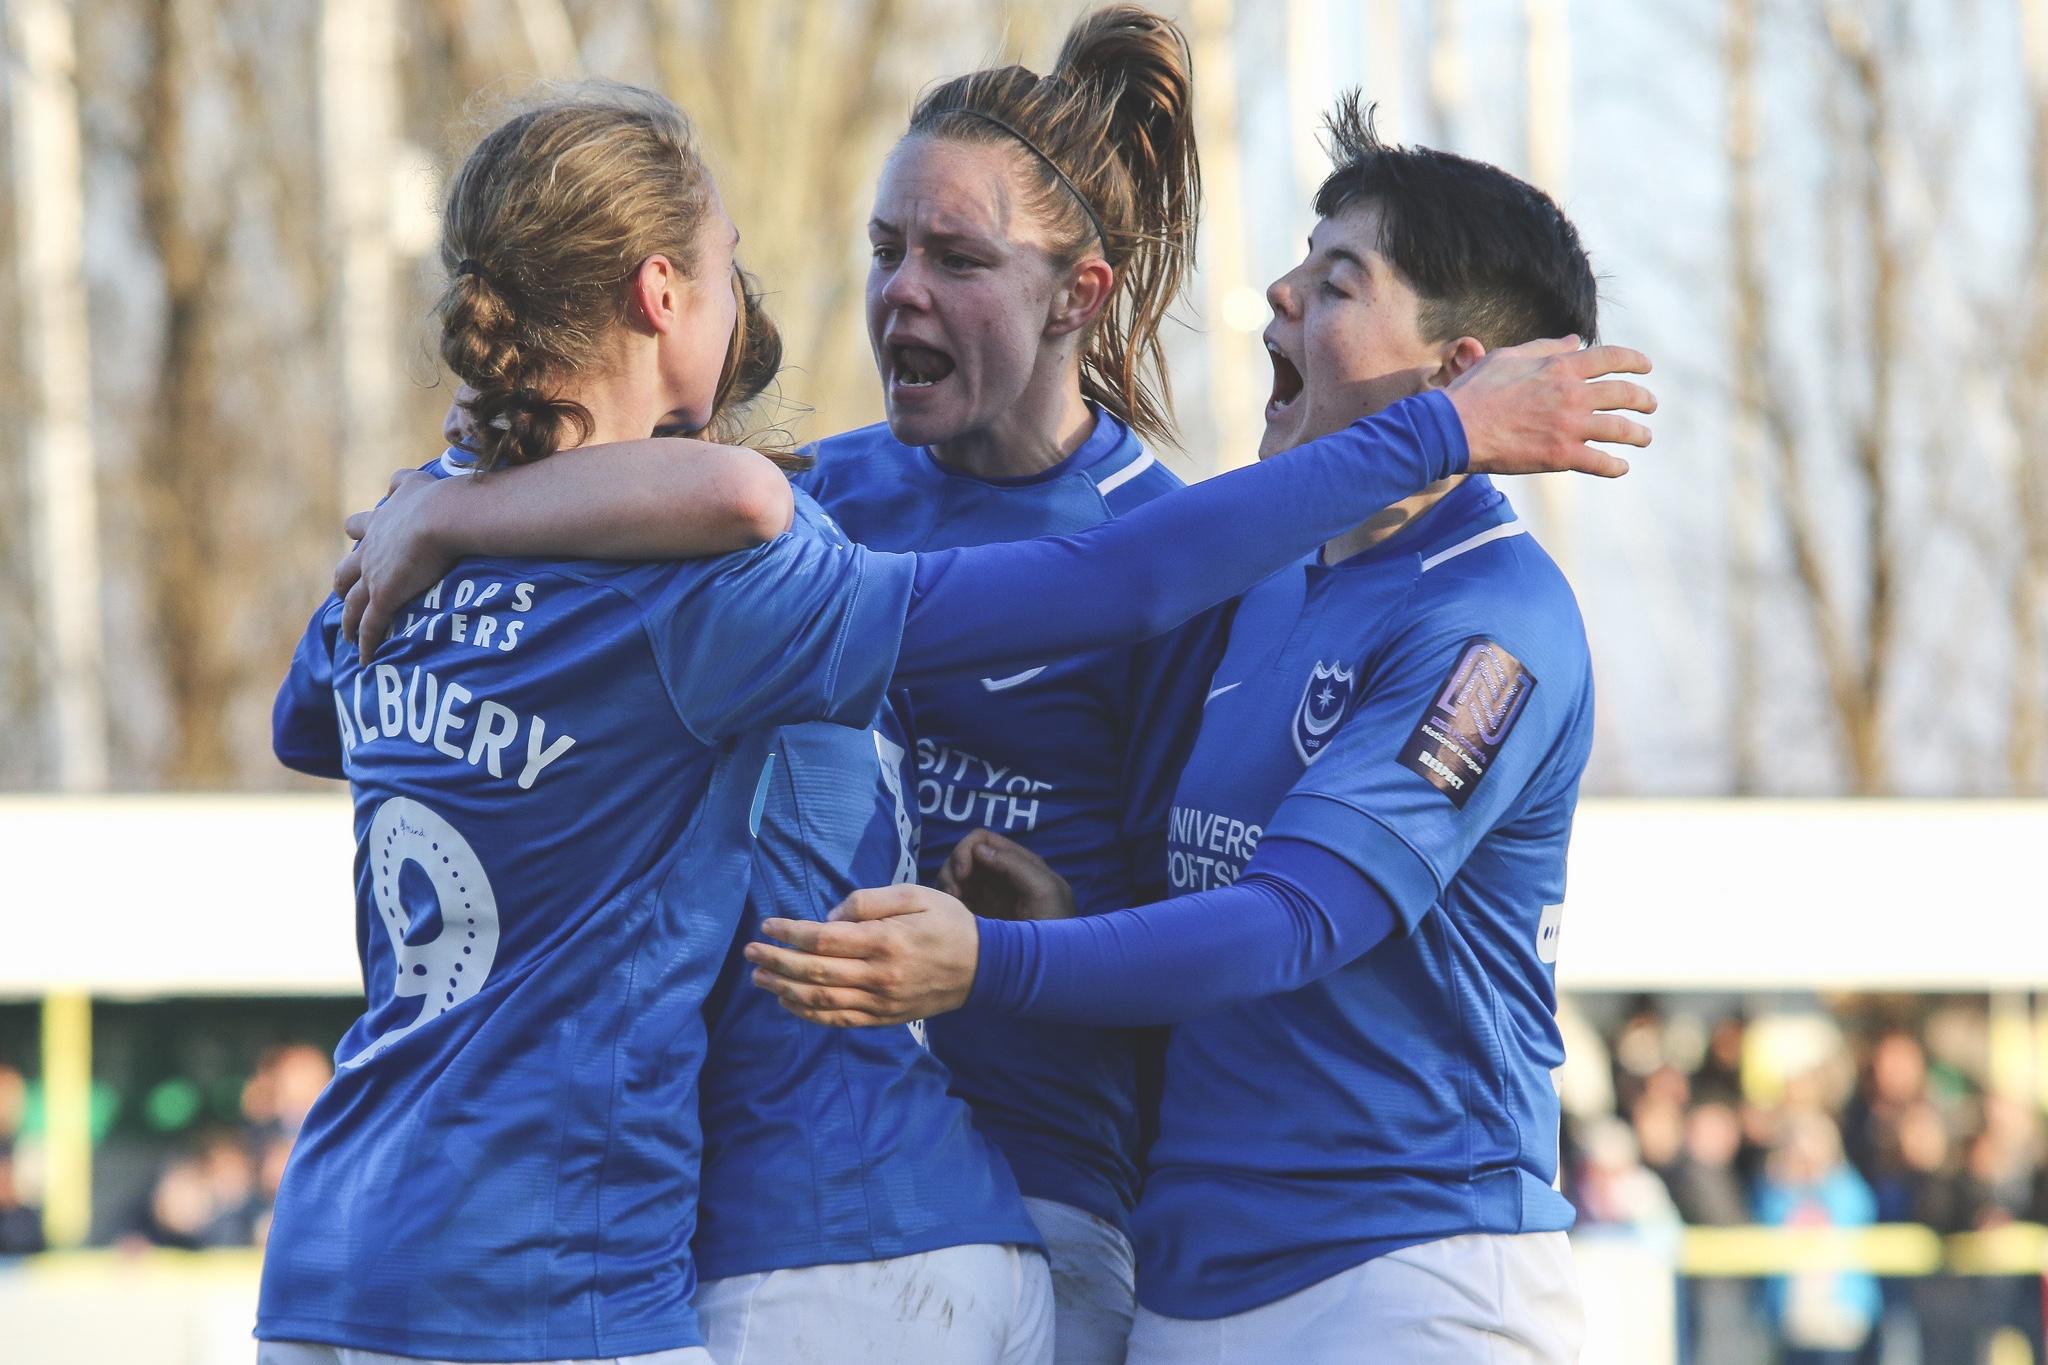 Katie James and the Portsmouth FC Women celebrating. Taken by Jordan Hampton.